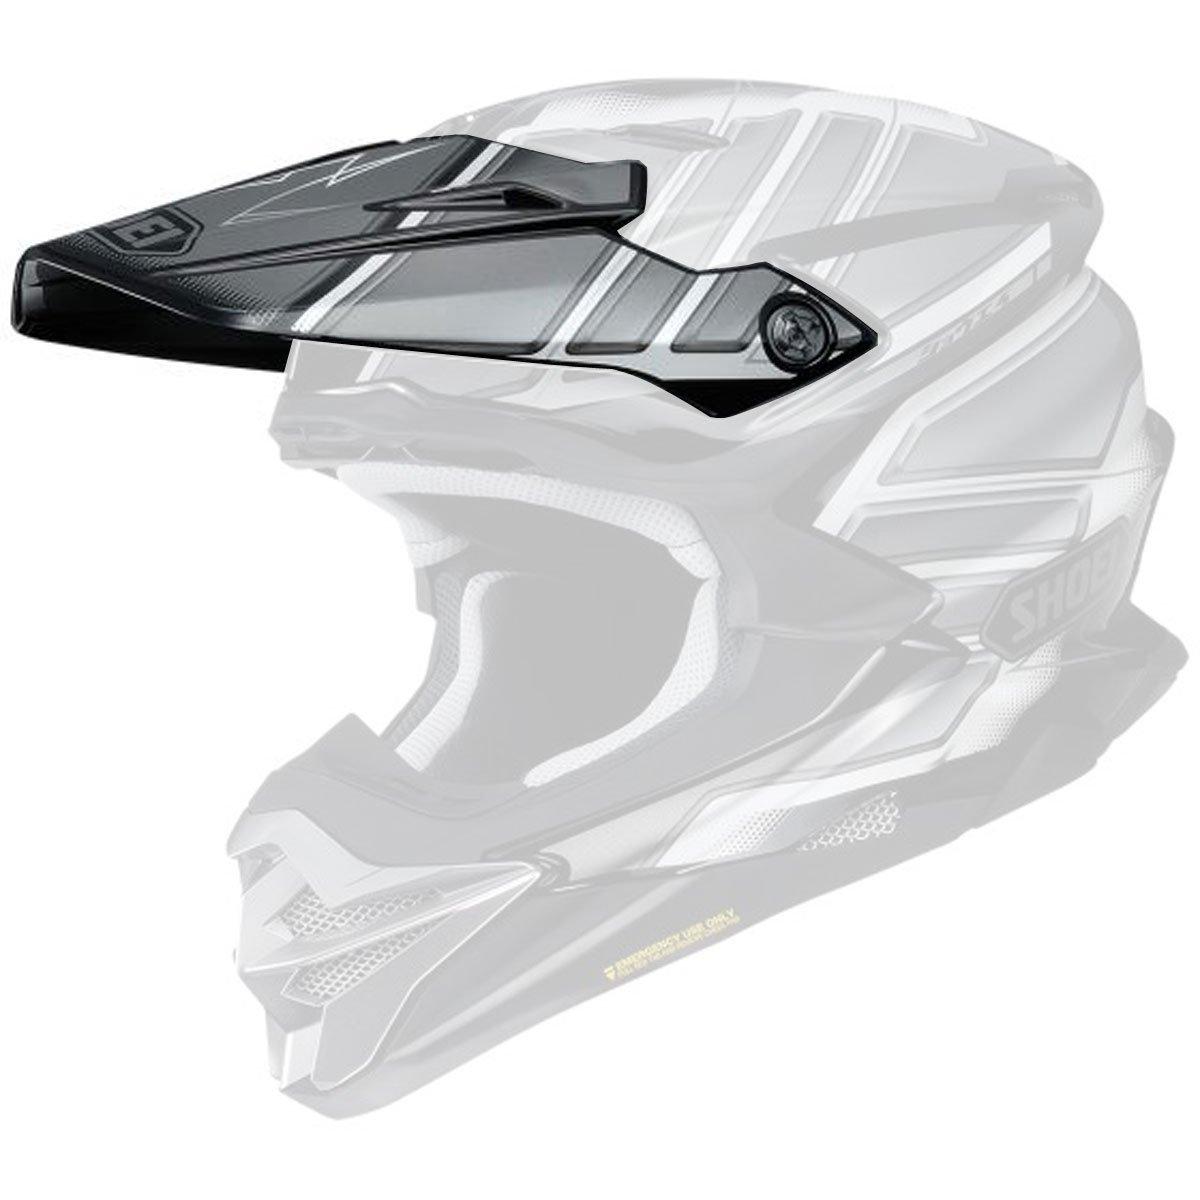 Shoei VFX-Evo Visor Glaive Off-Road Motorcycle Helmet Accessories - TC-5 / One Size